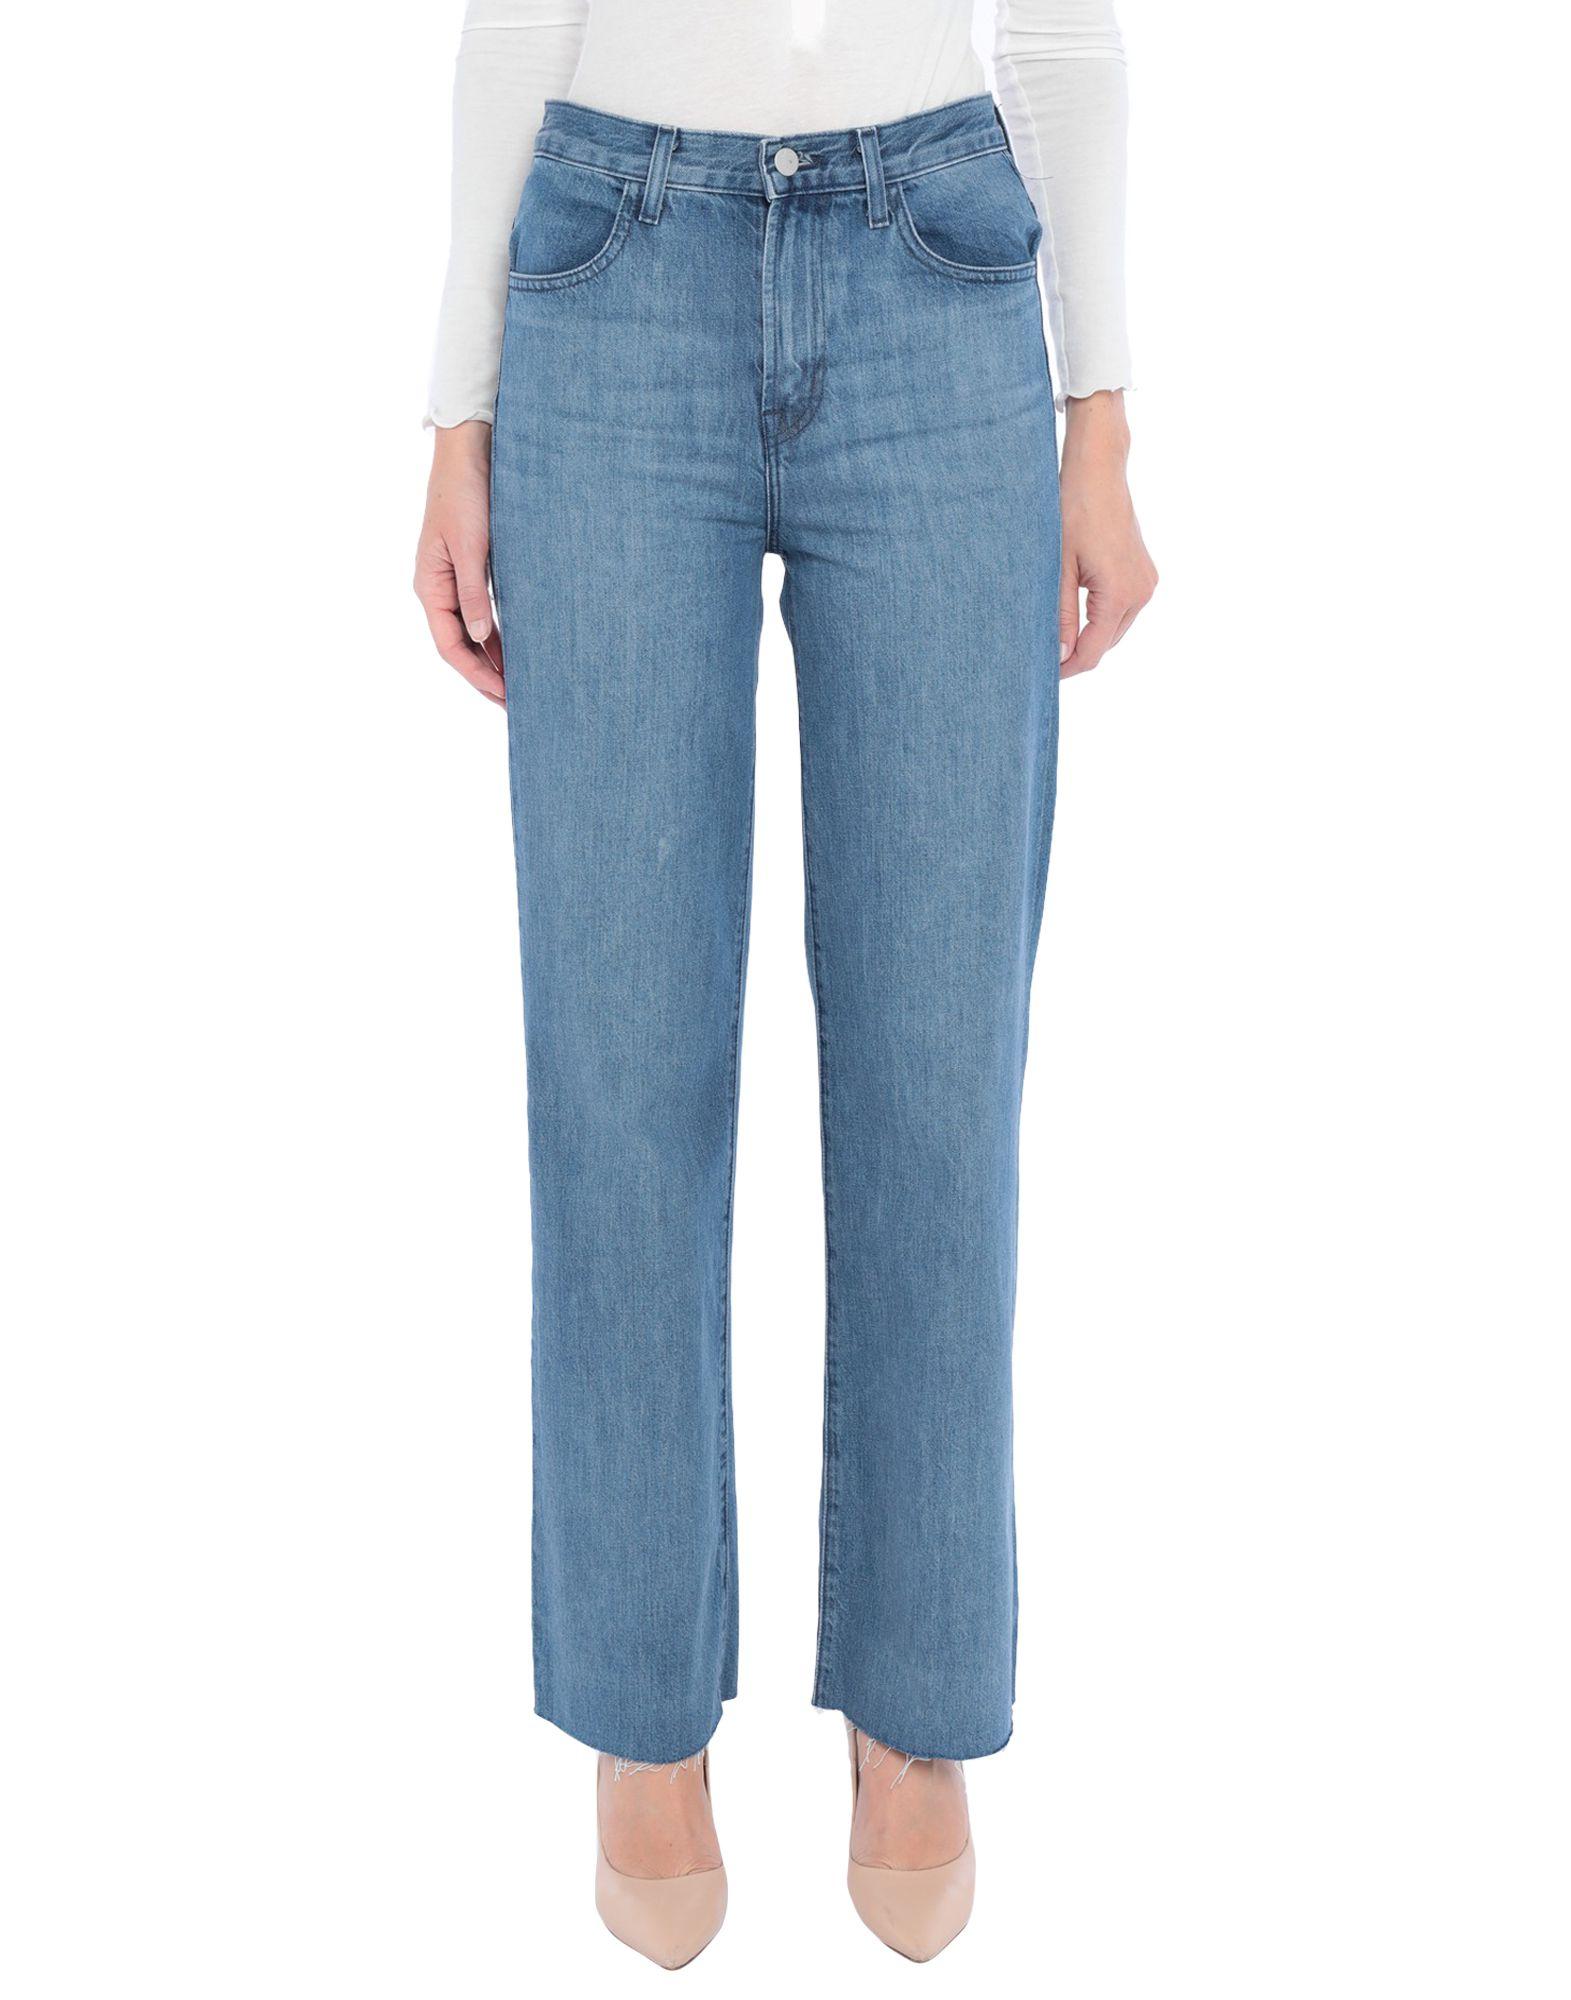 J BRAND Denim pants - Item 42764475